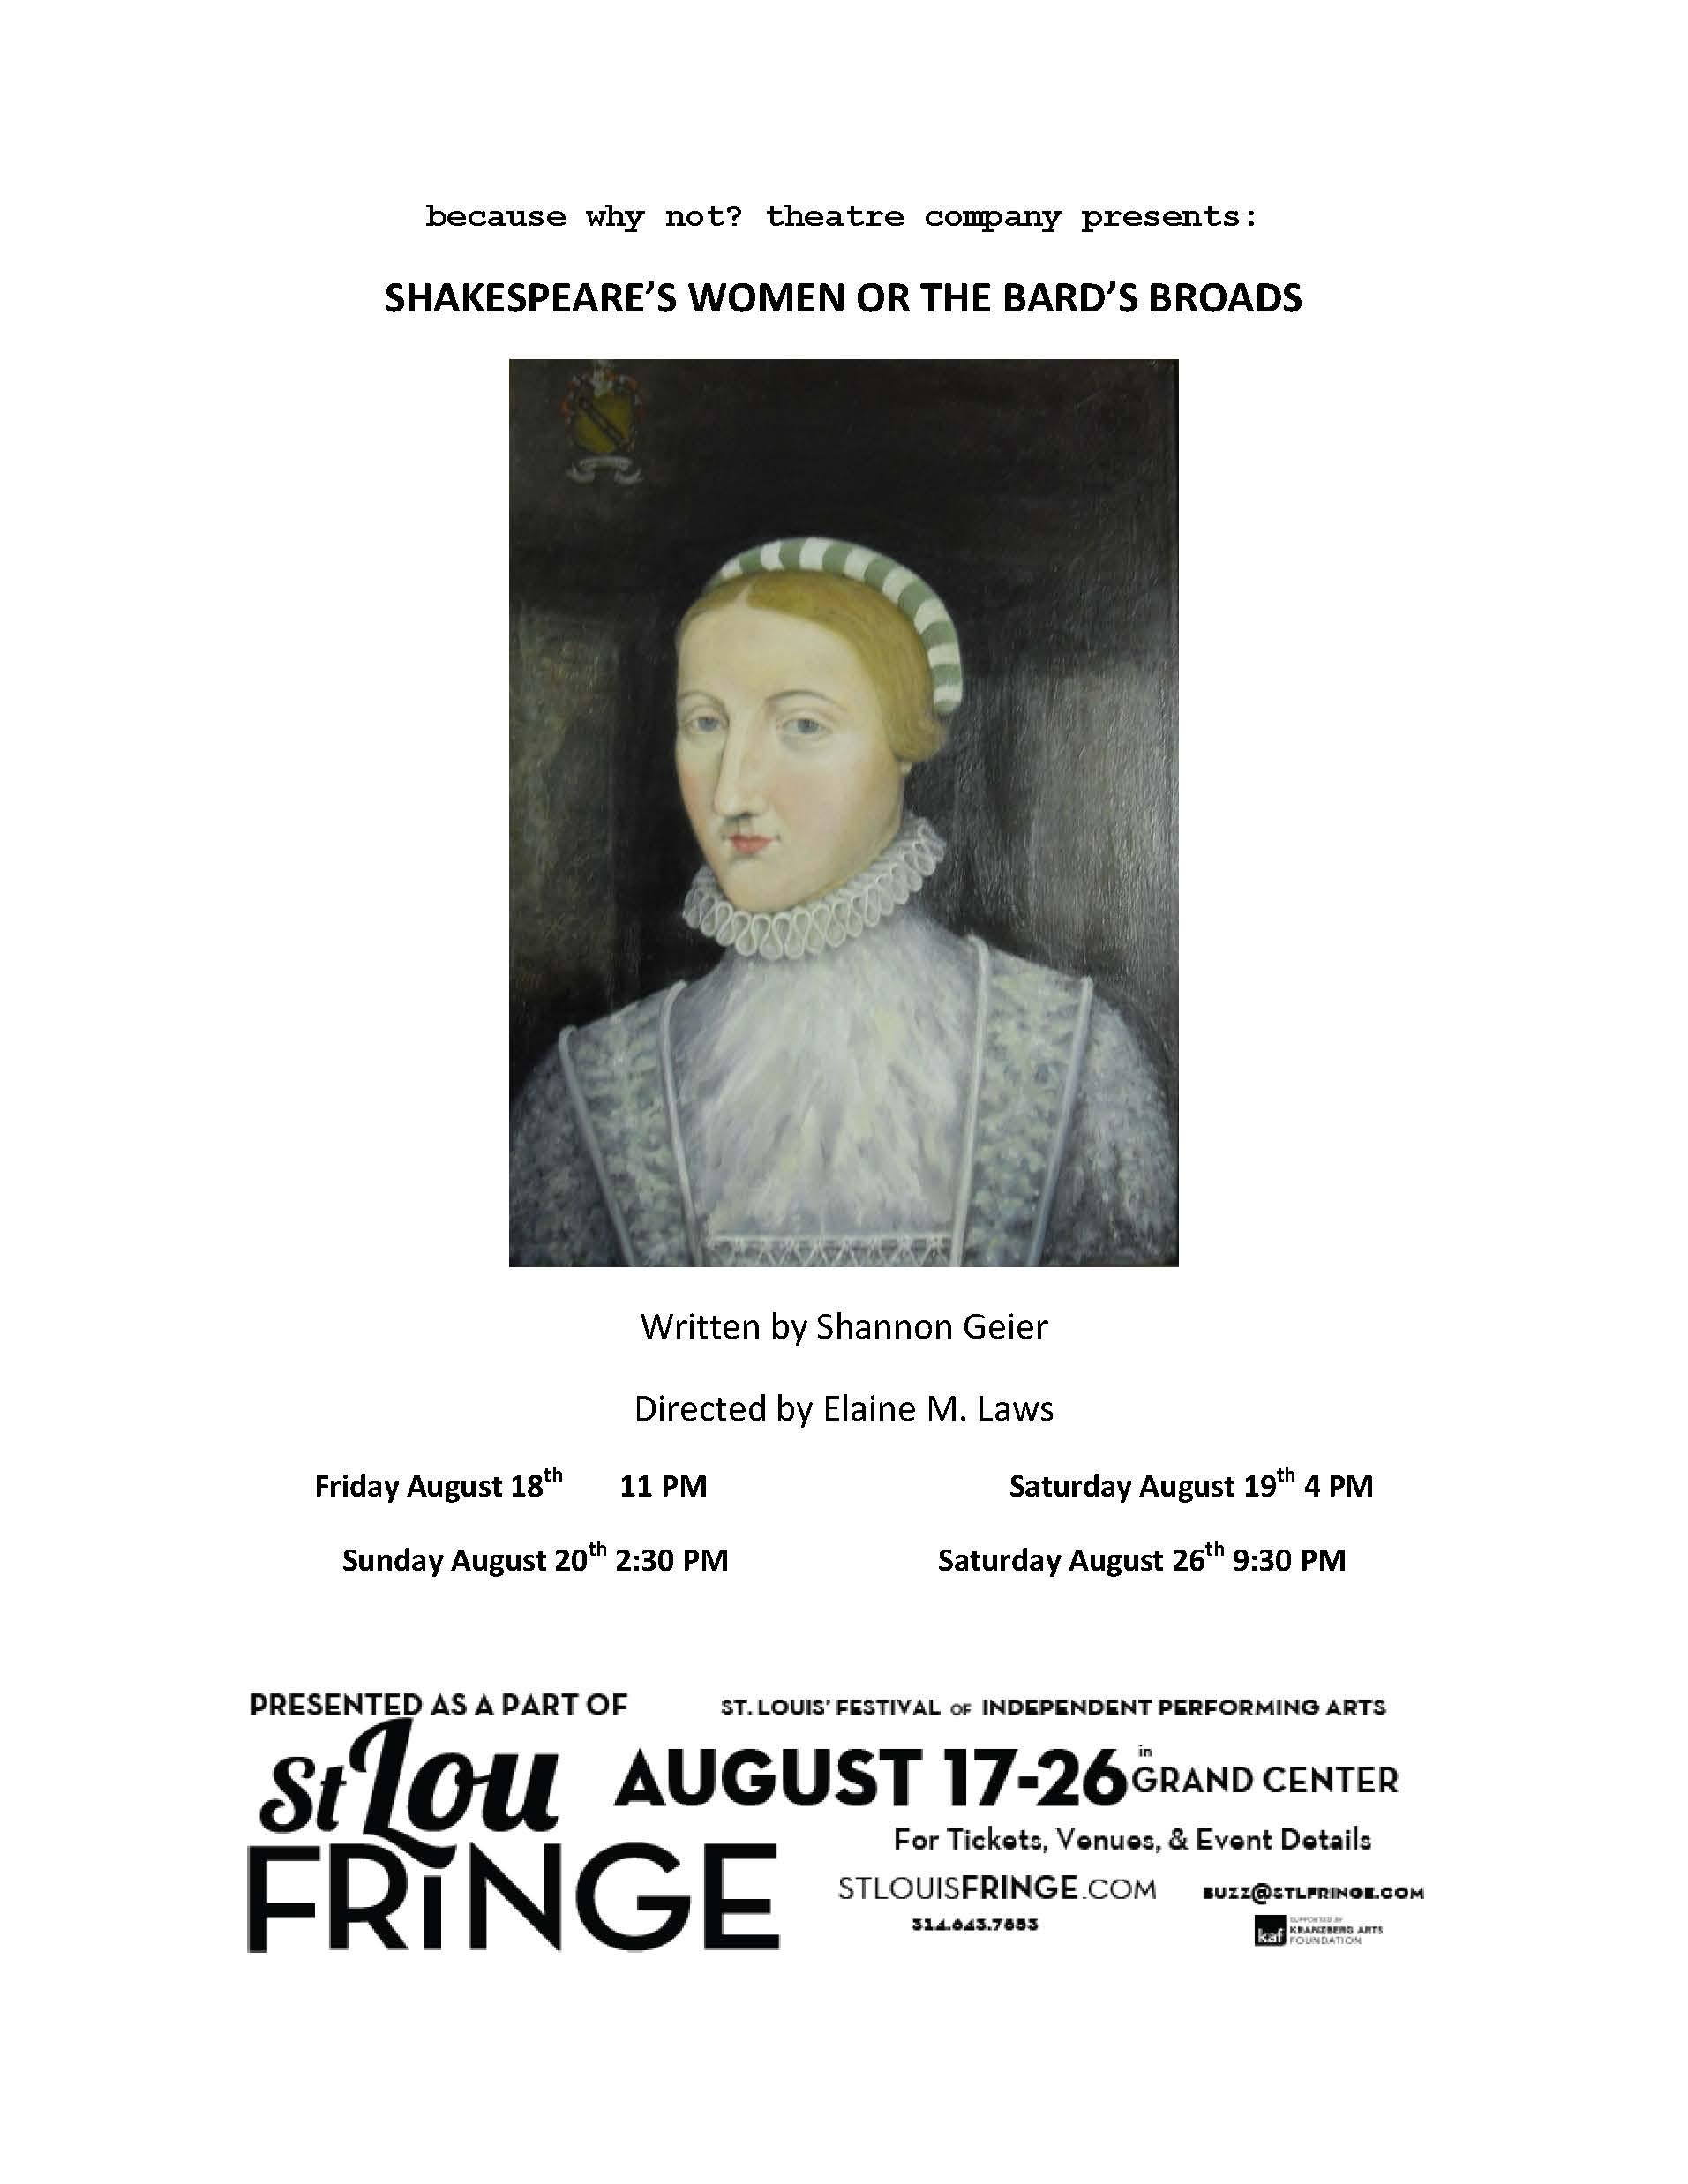 Shakespeare's Women Flier.jpg